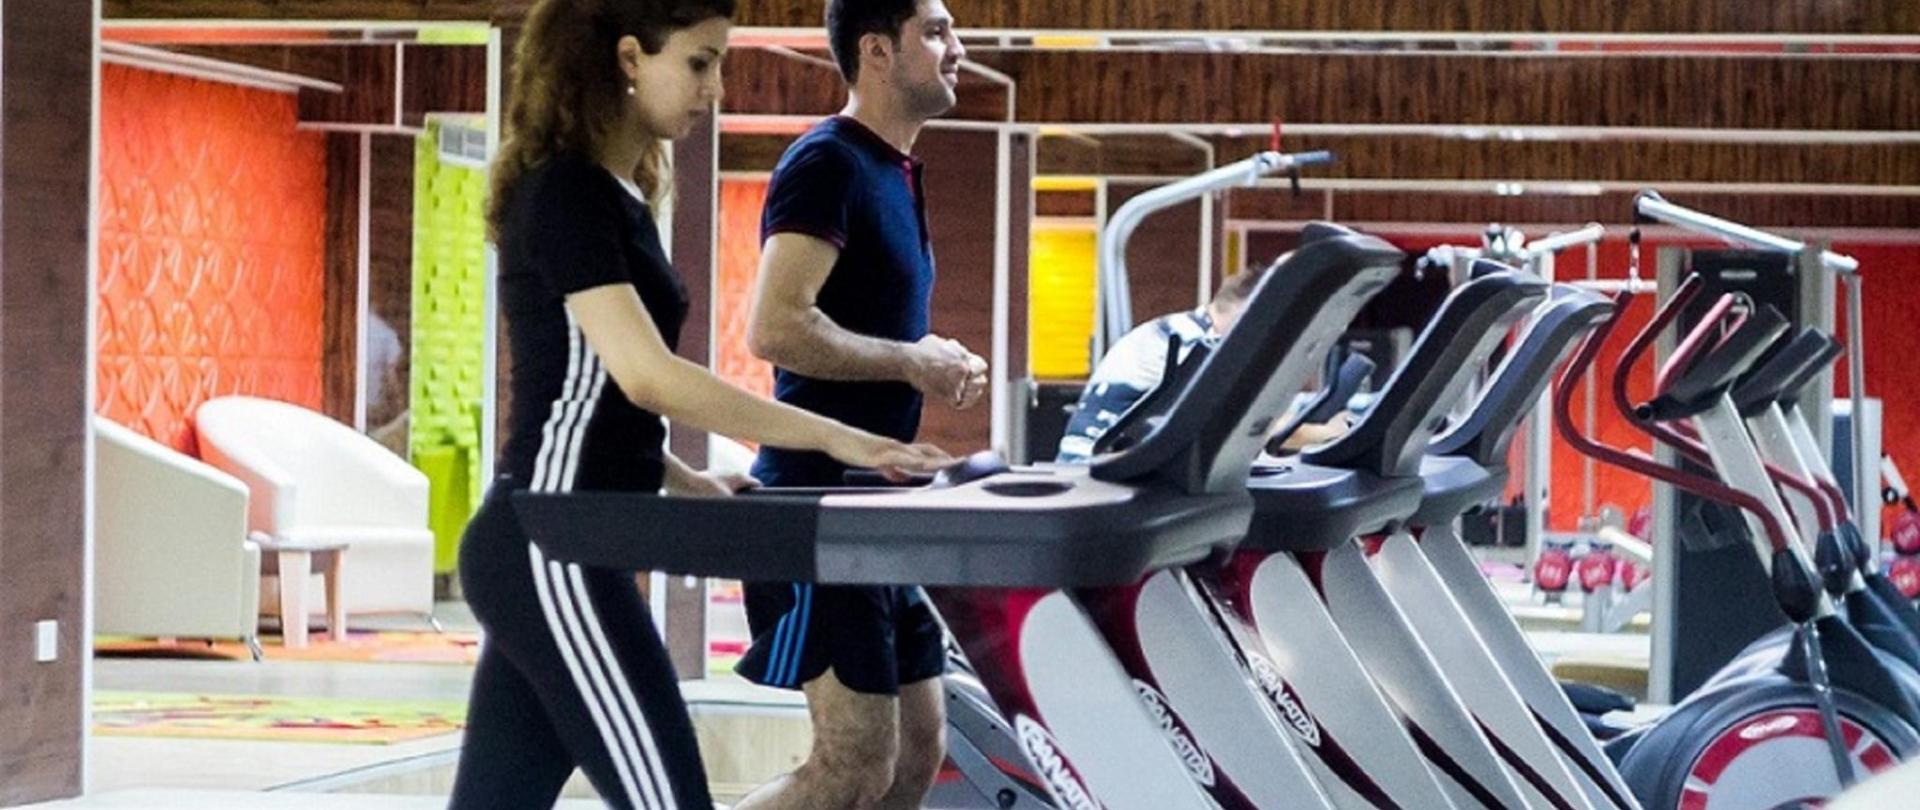 Fitnes (1).jpg